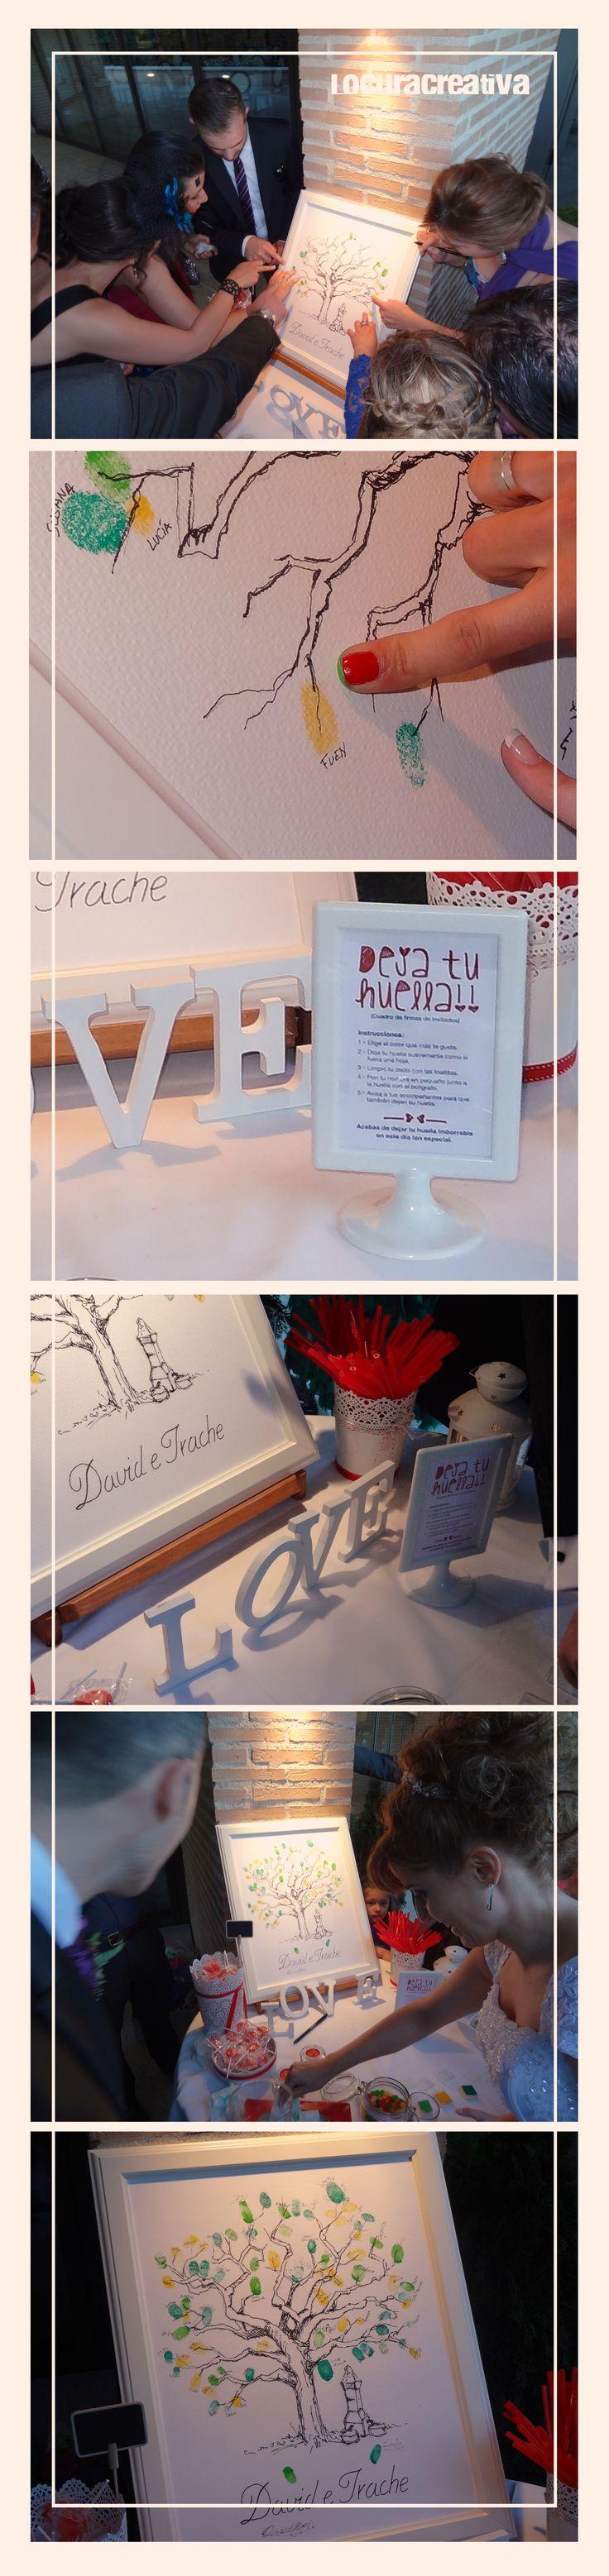 regalo bodas #arbol firmas #wedding #locuracreativa